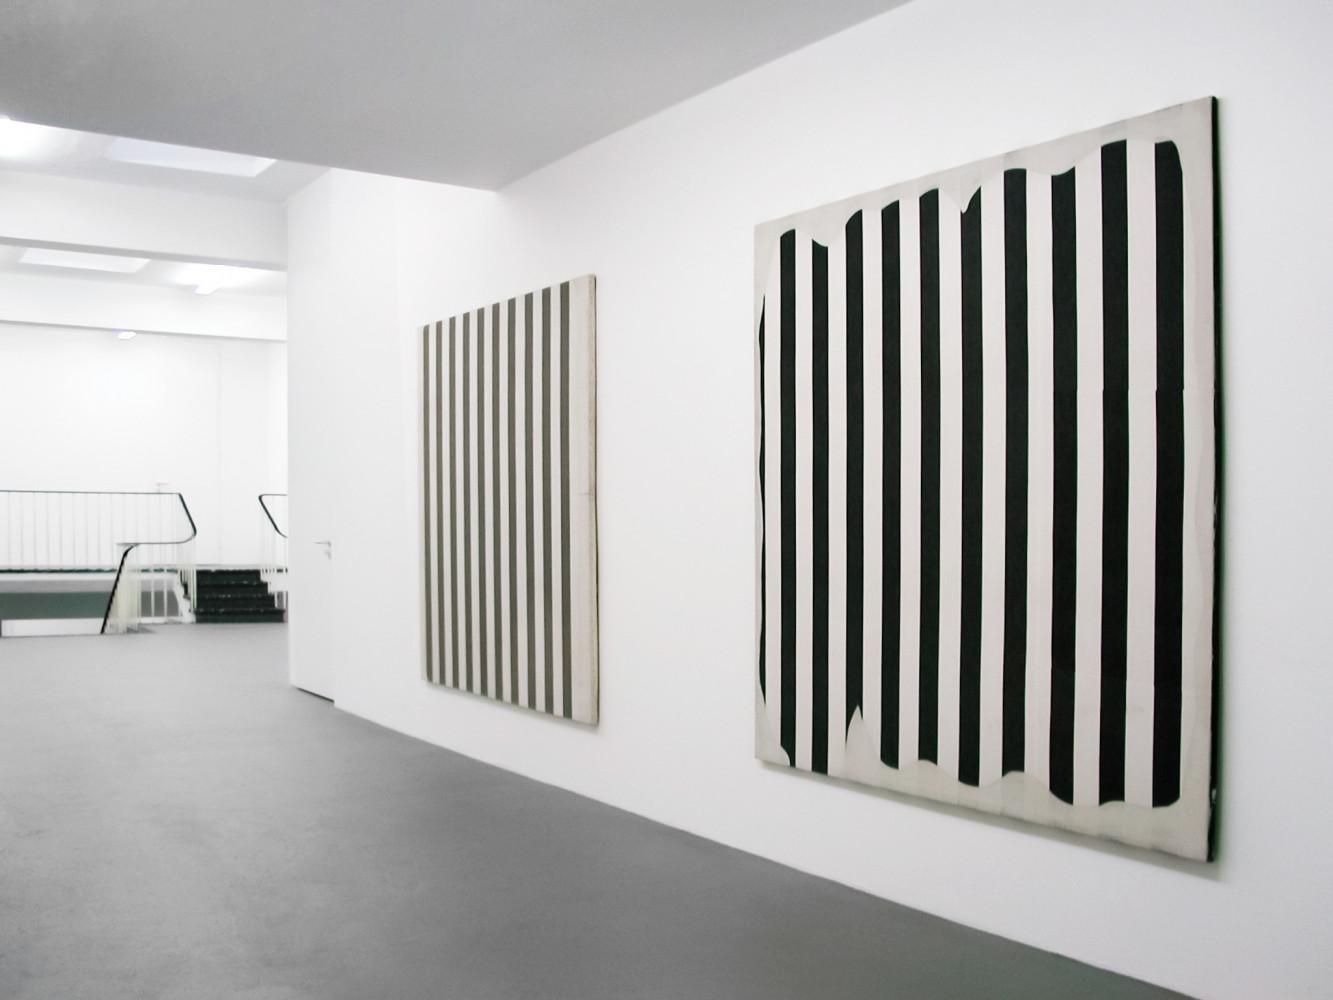 Daniel Buren, 'Peinture blanche 1965 - 1966', Installation view, 2002